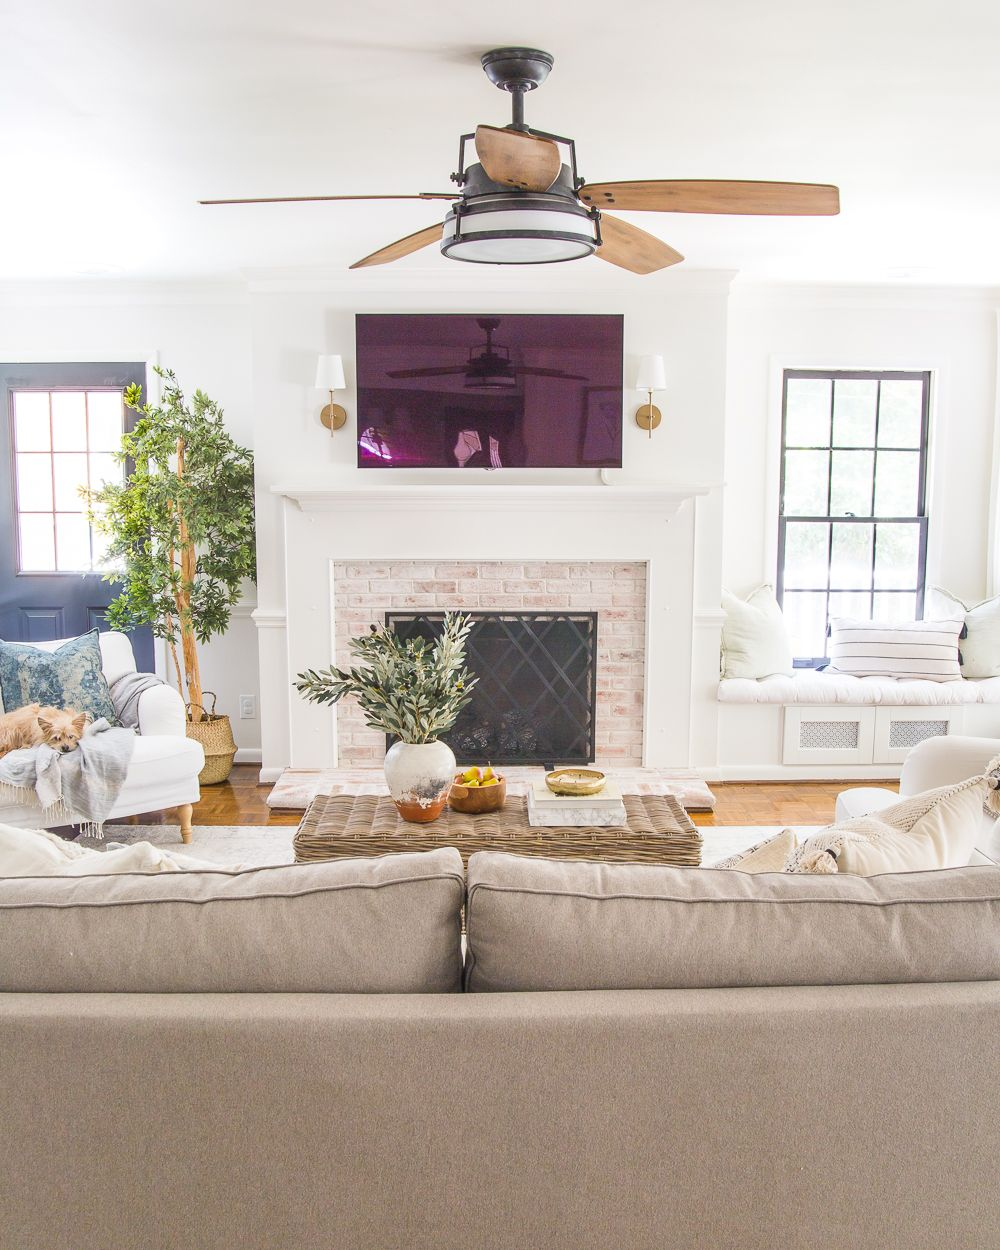 20 Gorgeous Modern Ceiling Fans Modern Ceiling Fans Living Room